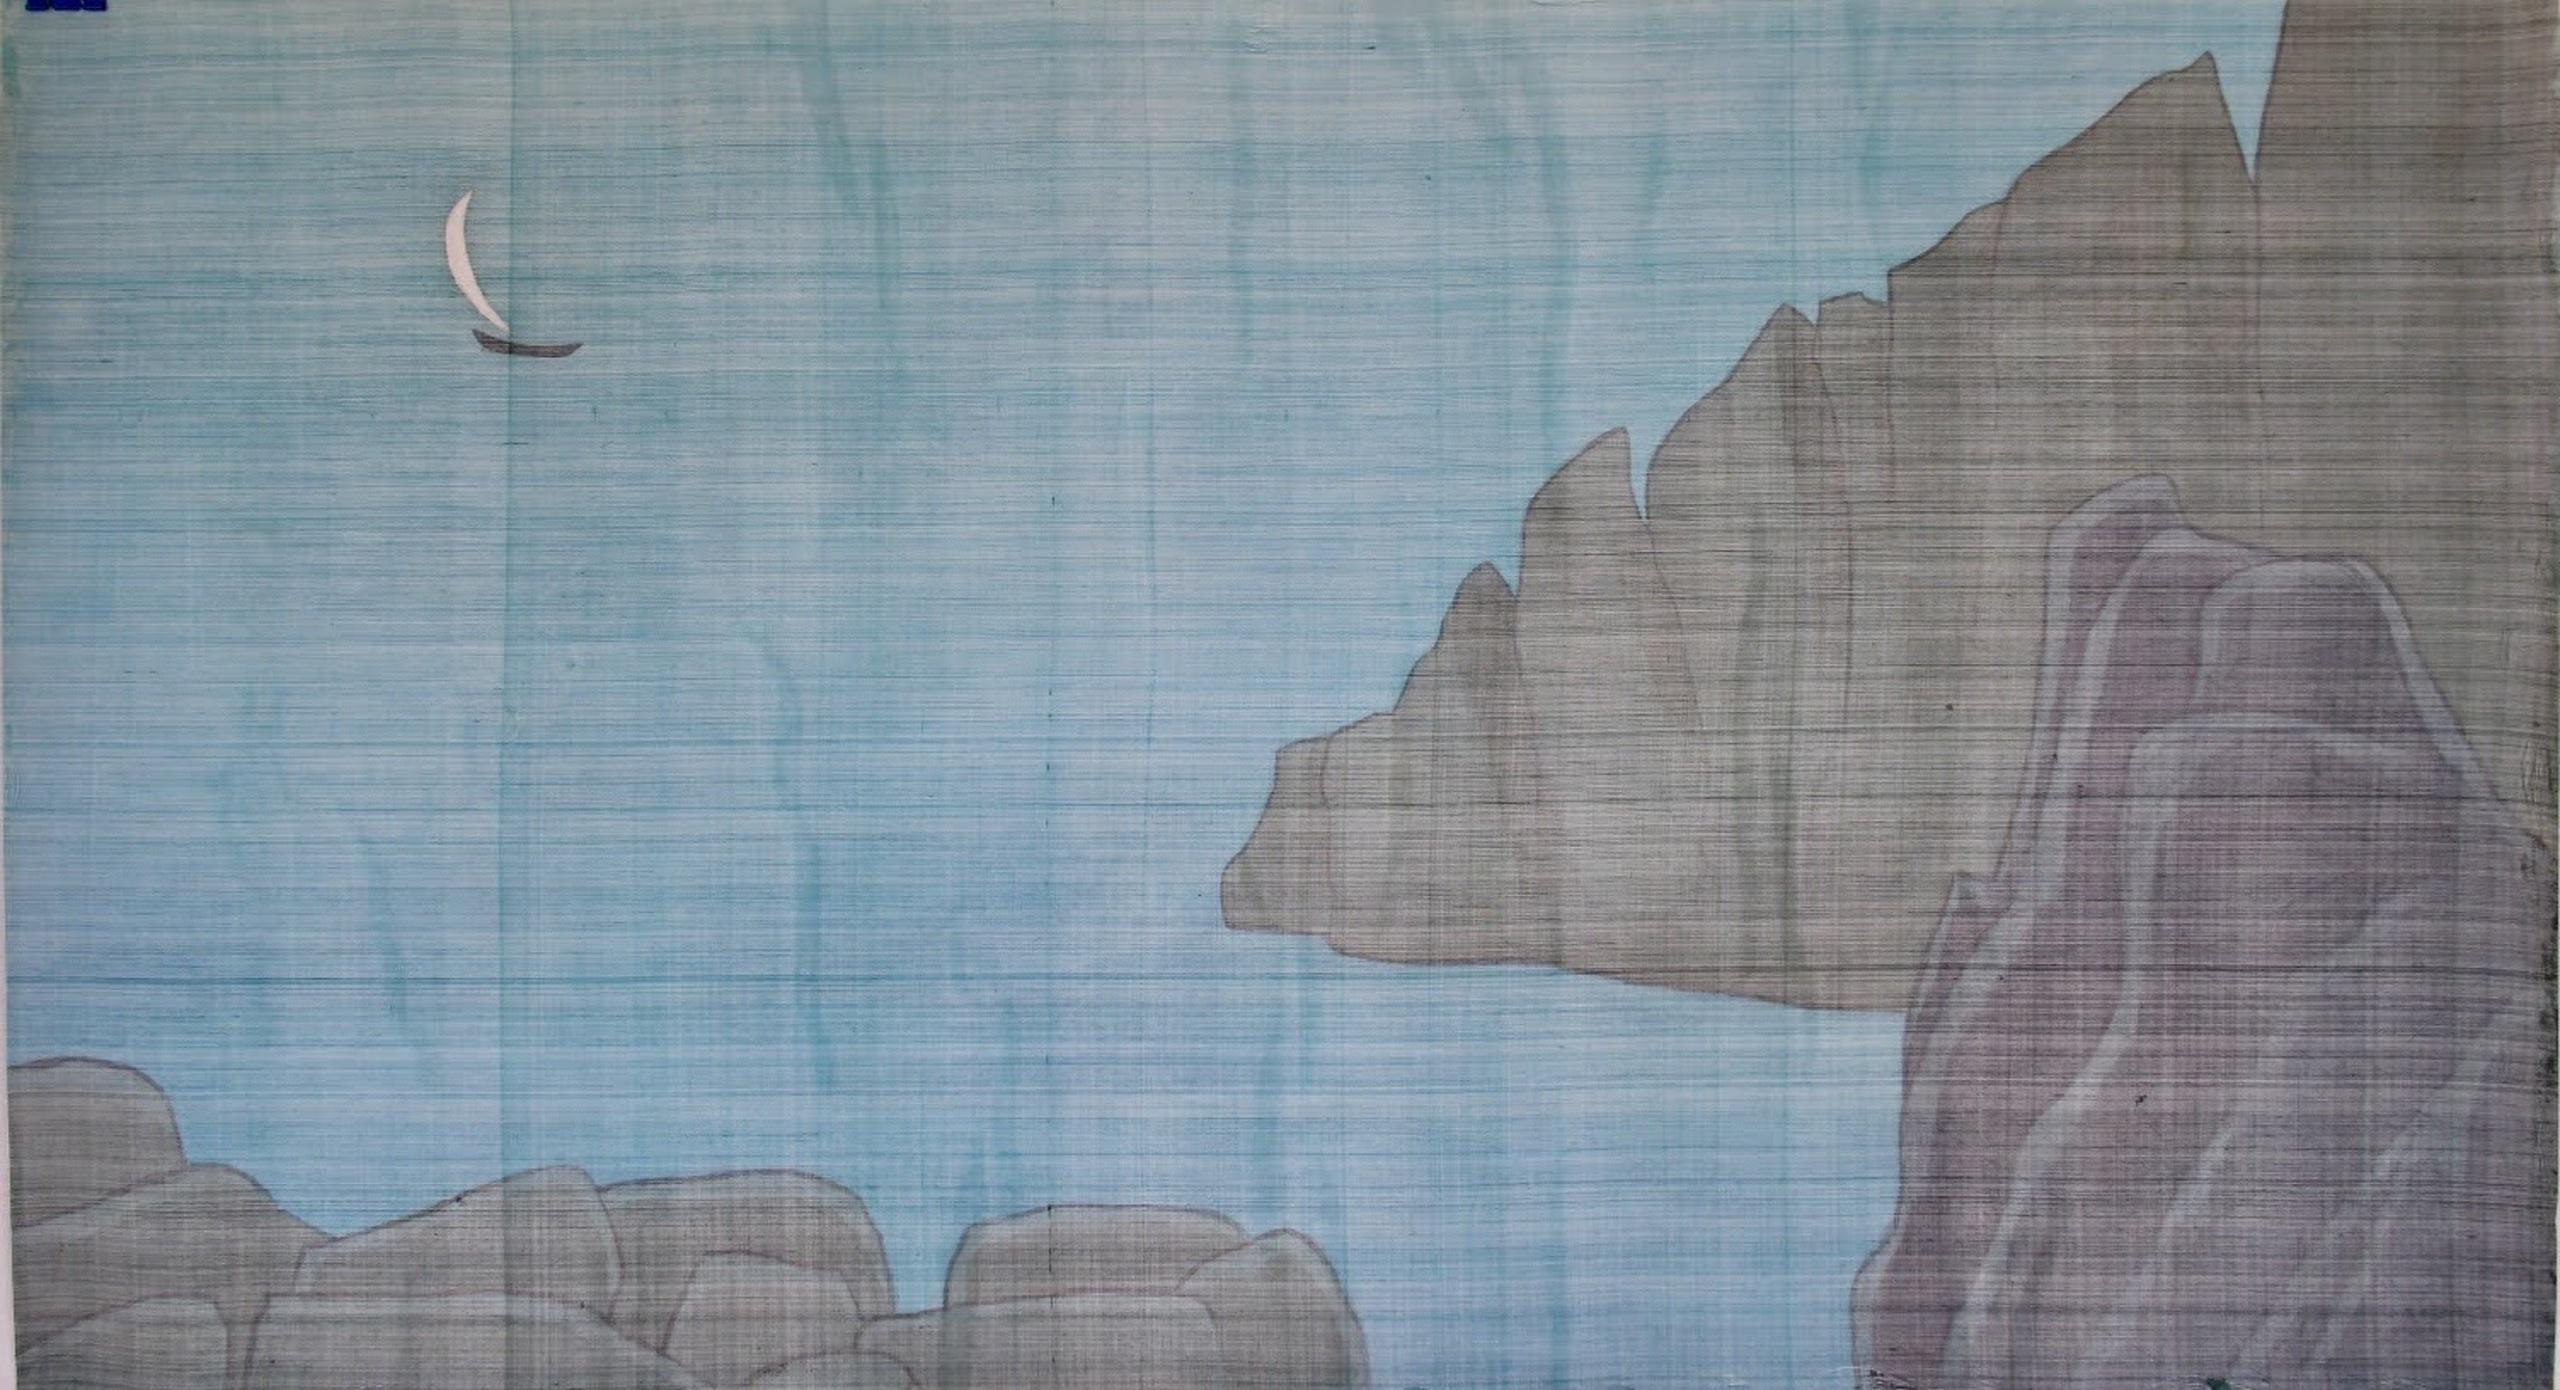 Nha Trang Sea, silk painting, 87cmx157cm by the artist Hoang Minh Hang in a supplied photo.